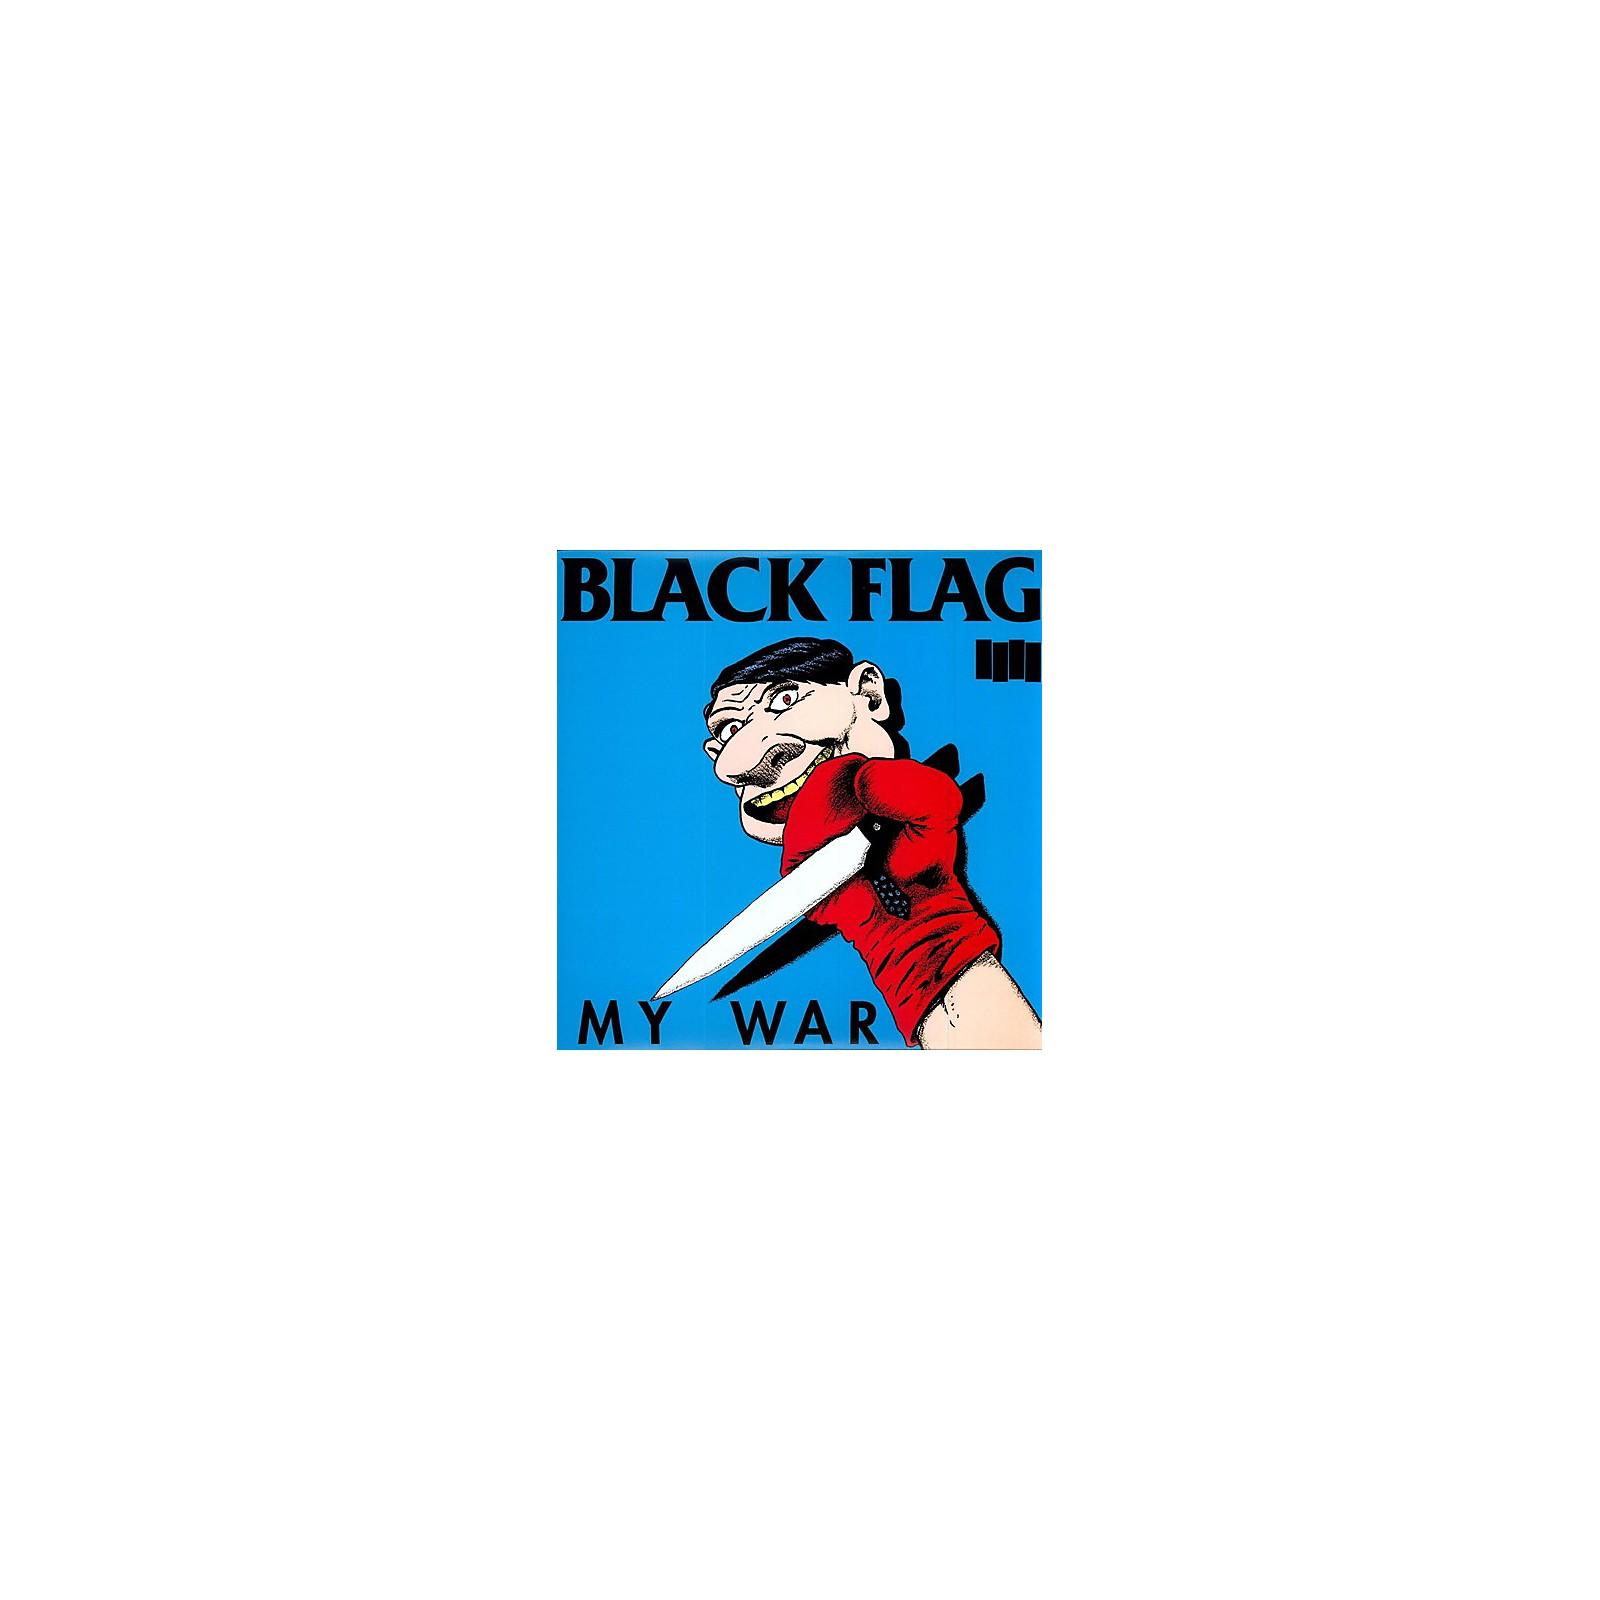 Alliance Black Flag - My War